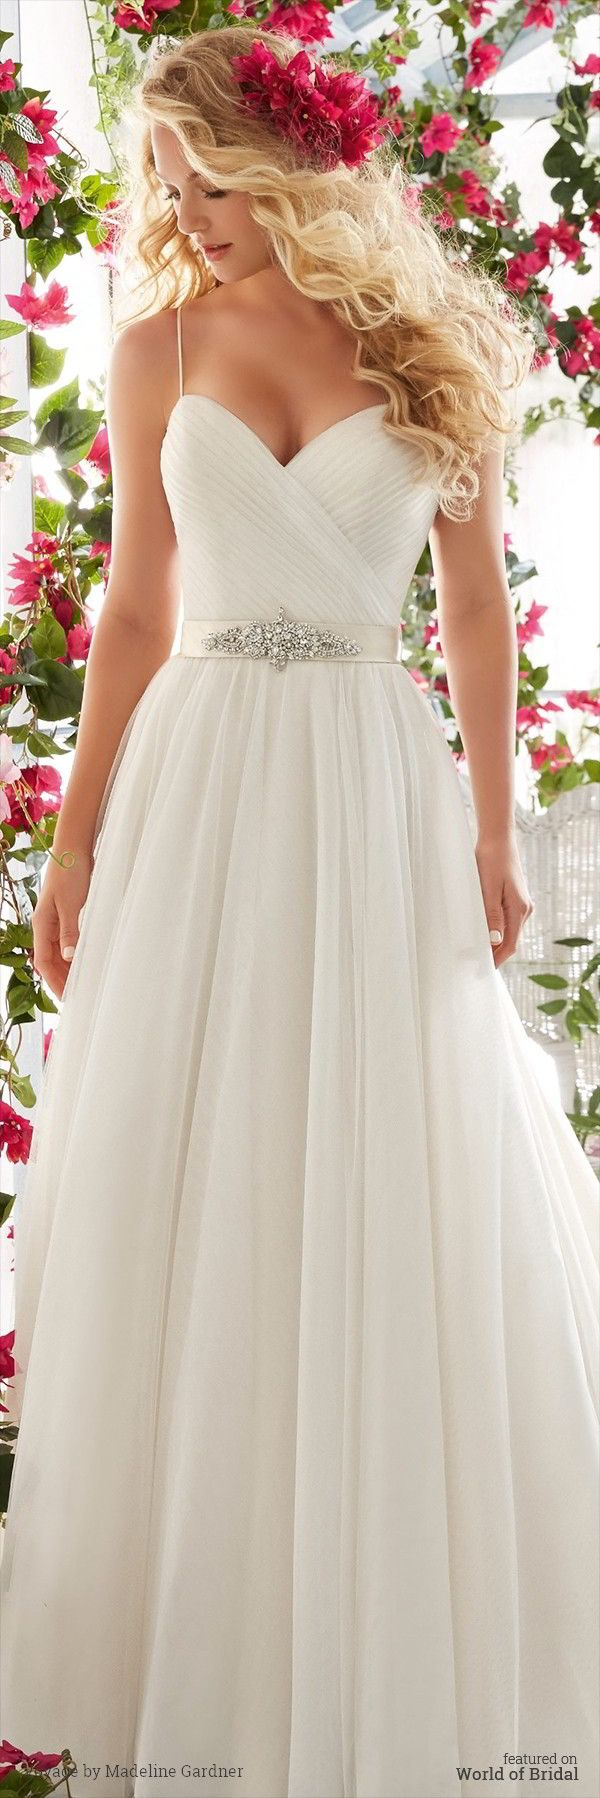 wedding dress simple wedding gown Voyage by Madeline Gardner Spring Wedding Dresses Mori Lee